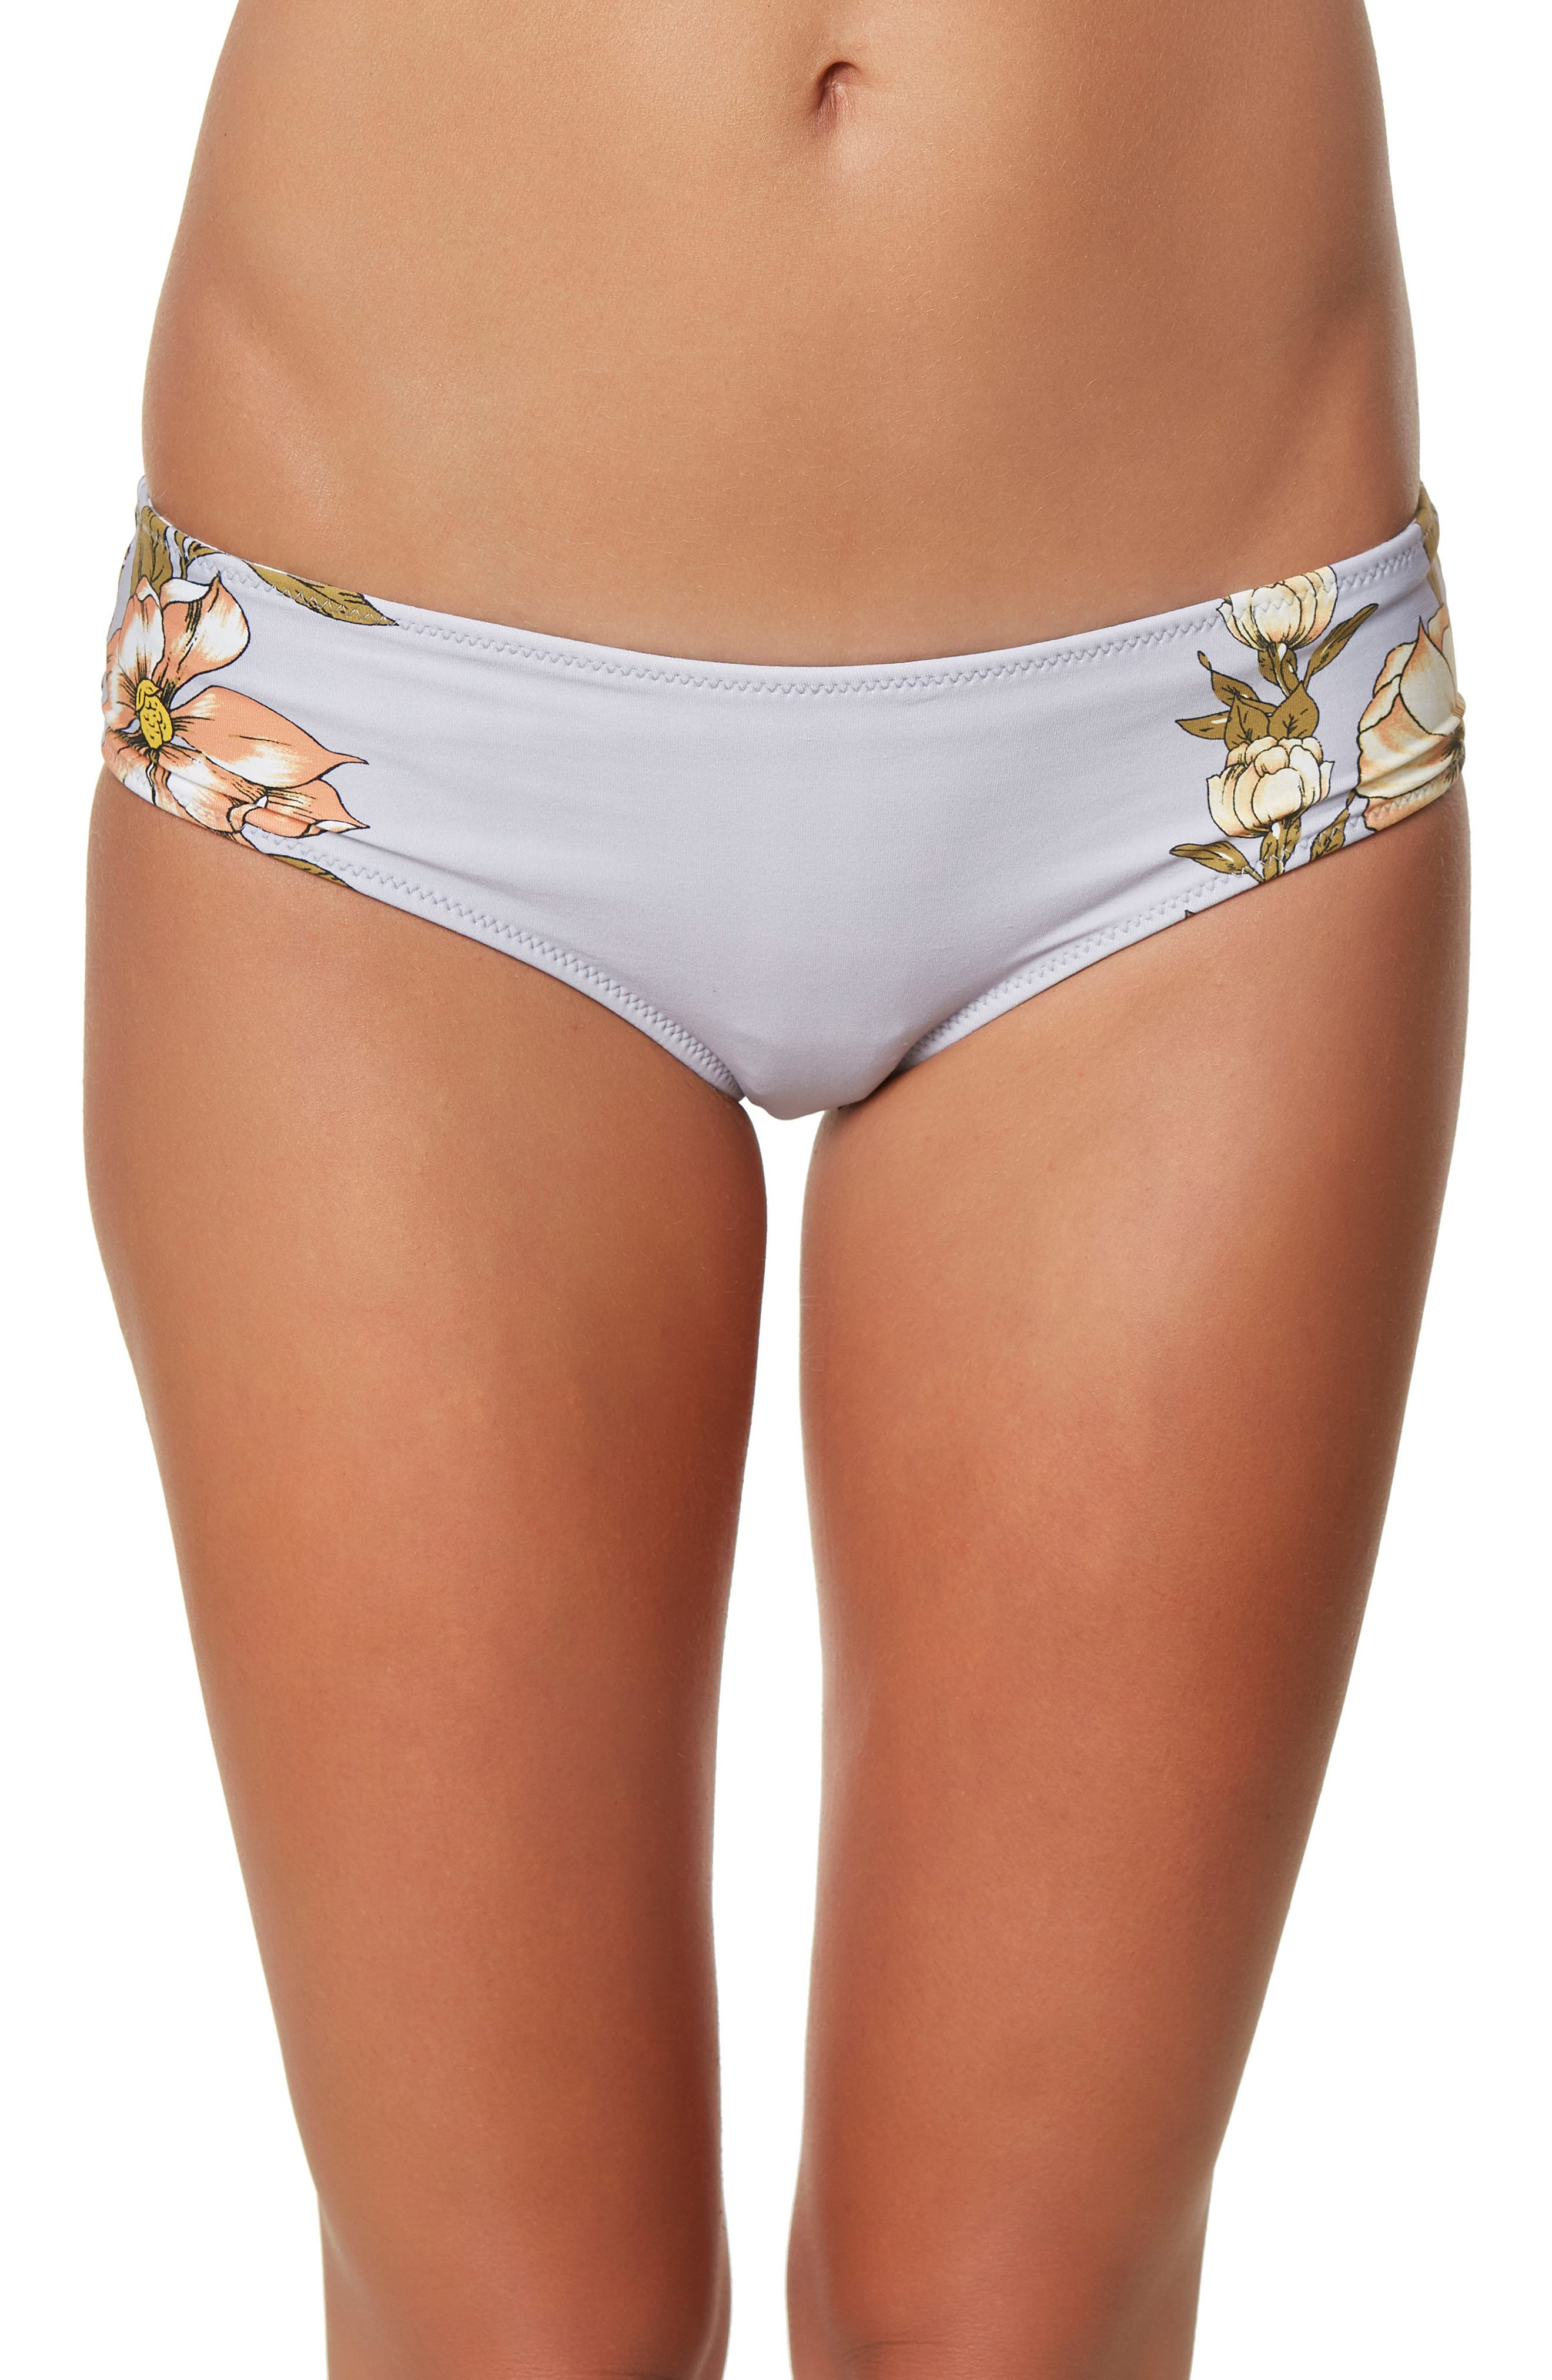 Aloha Floral Revo Hipster Bikini Bottoms,                             Main thumbnail 1, color,                             020